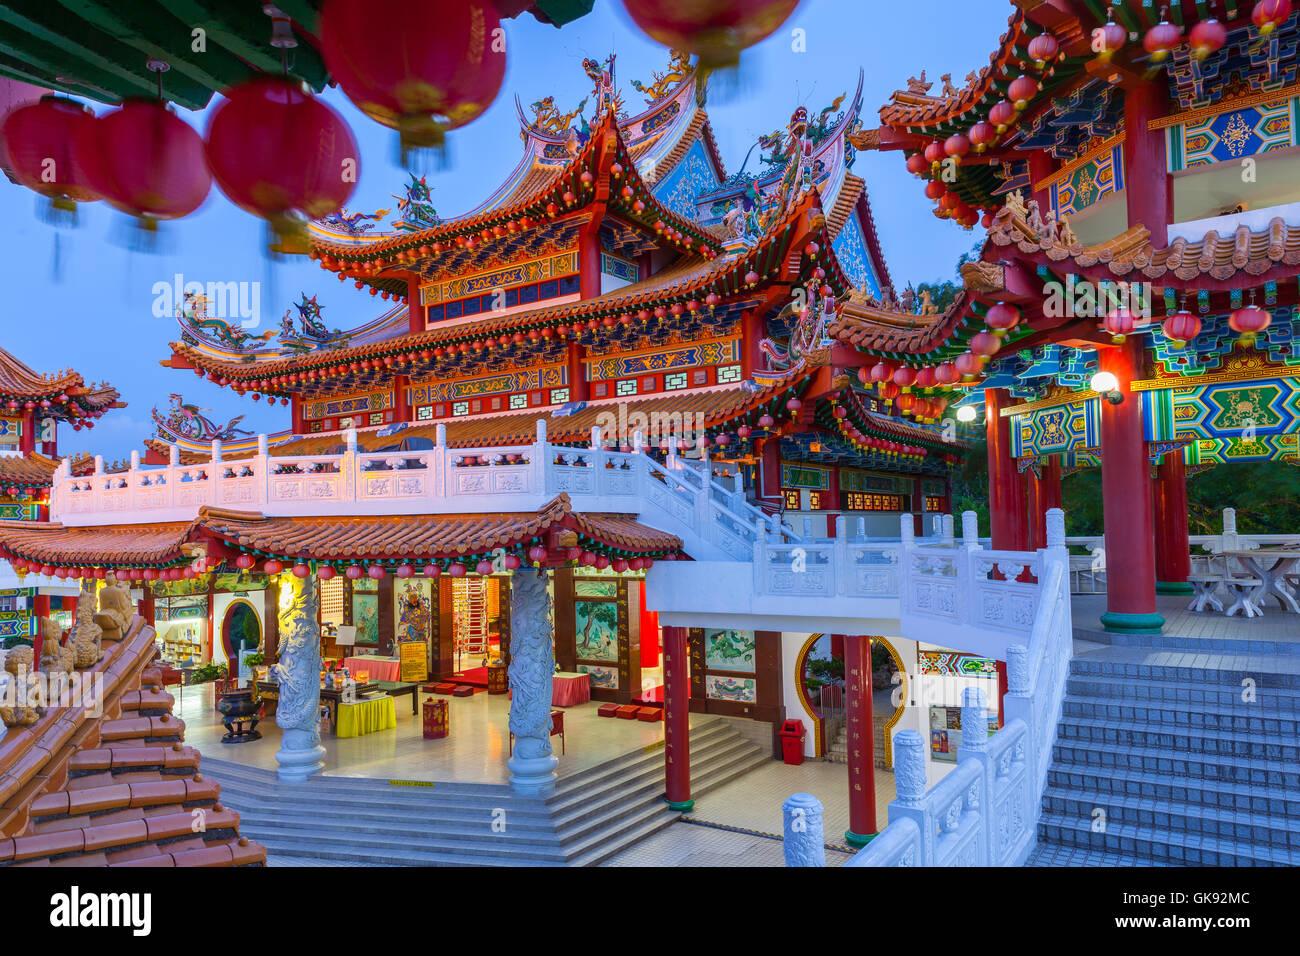 Thean Hou Buddhist Temple at dusk, Kuala Lumpur, Malaysia - Stock Image